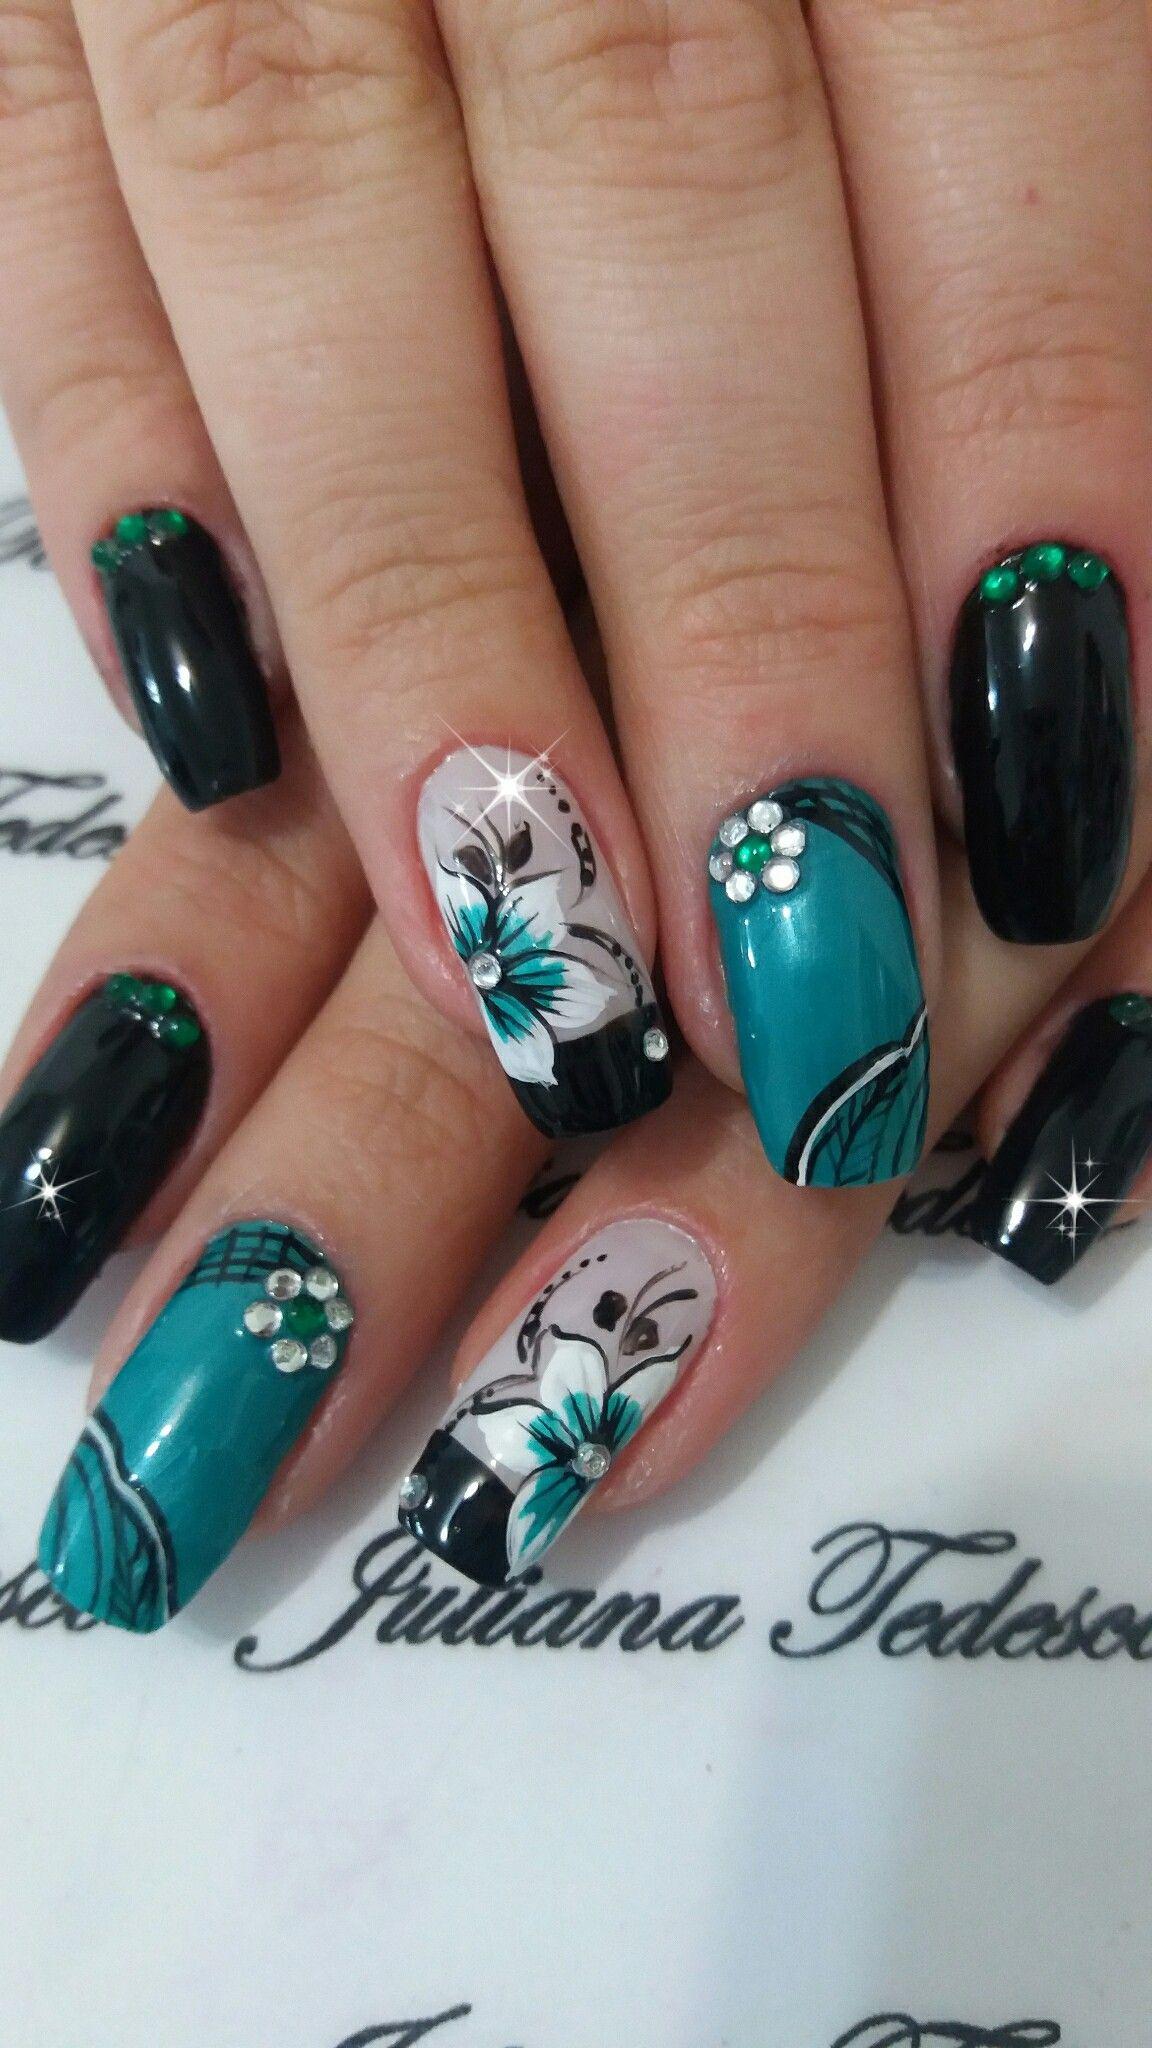 teal, white, & black nails | nail art& designs | pinterest | black